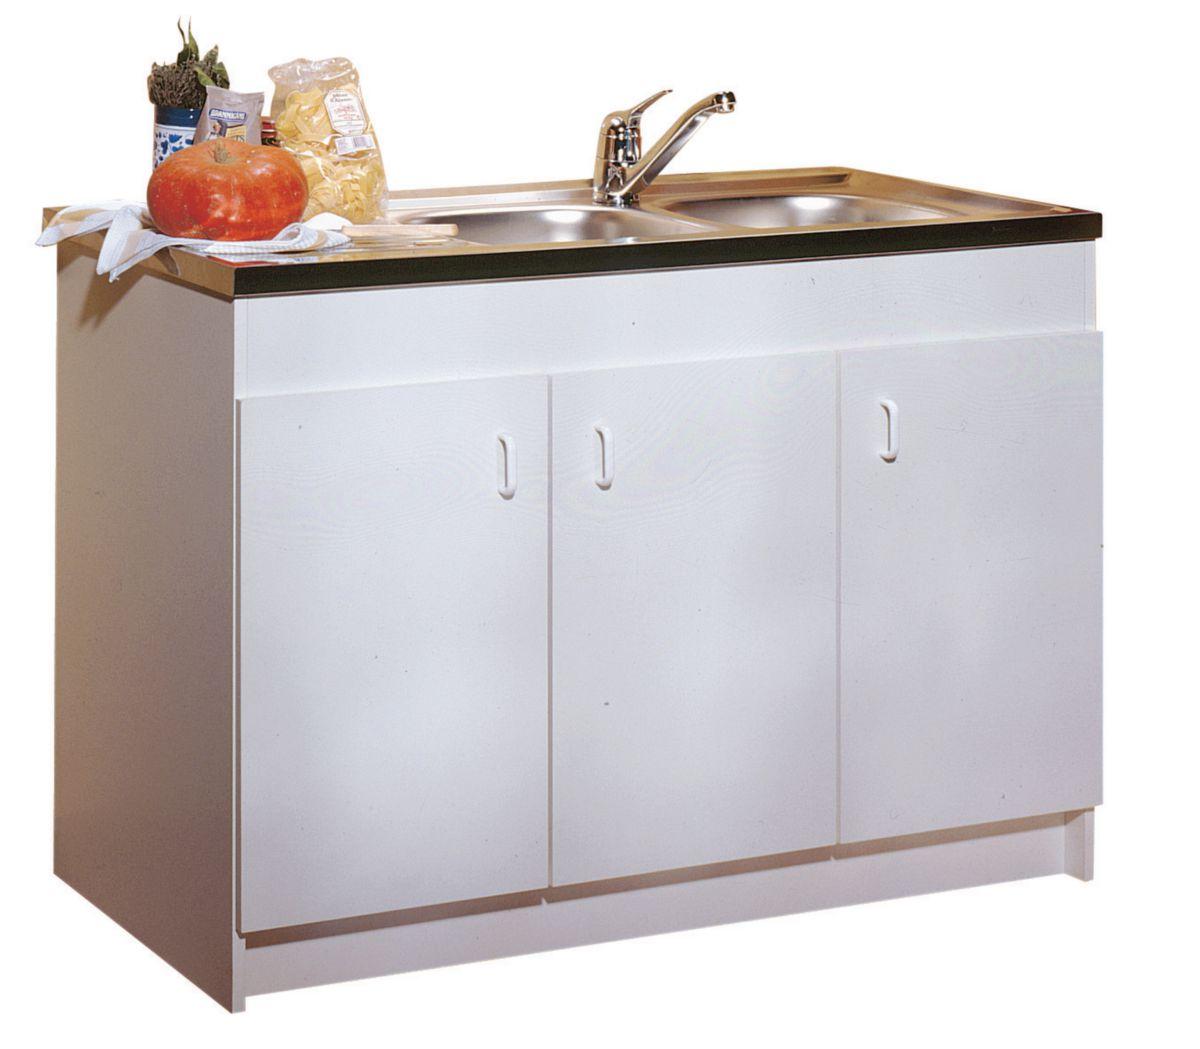 sous vier progres nf m lamin blanc 3 portes r f s10n03120 neova. Black Bedroom Furniture Sets. Home Design Ideas